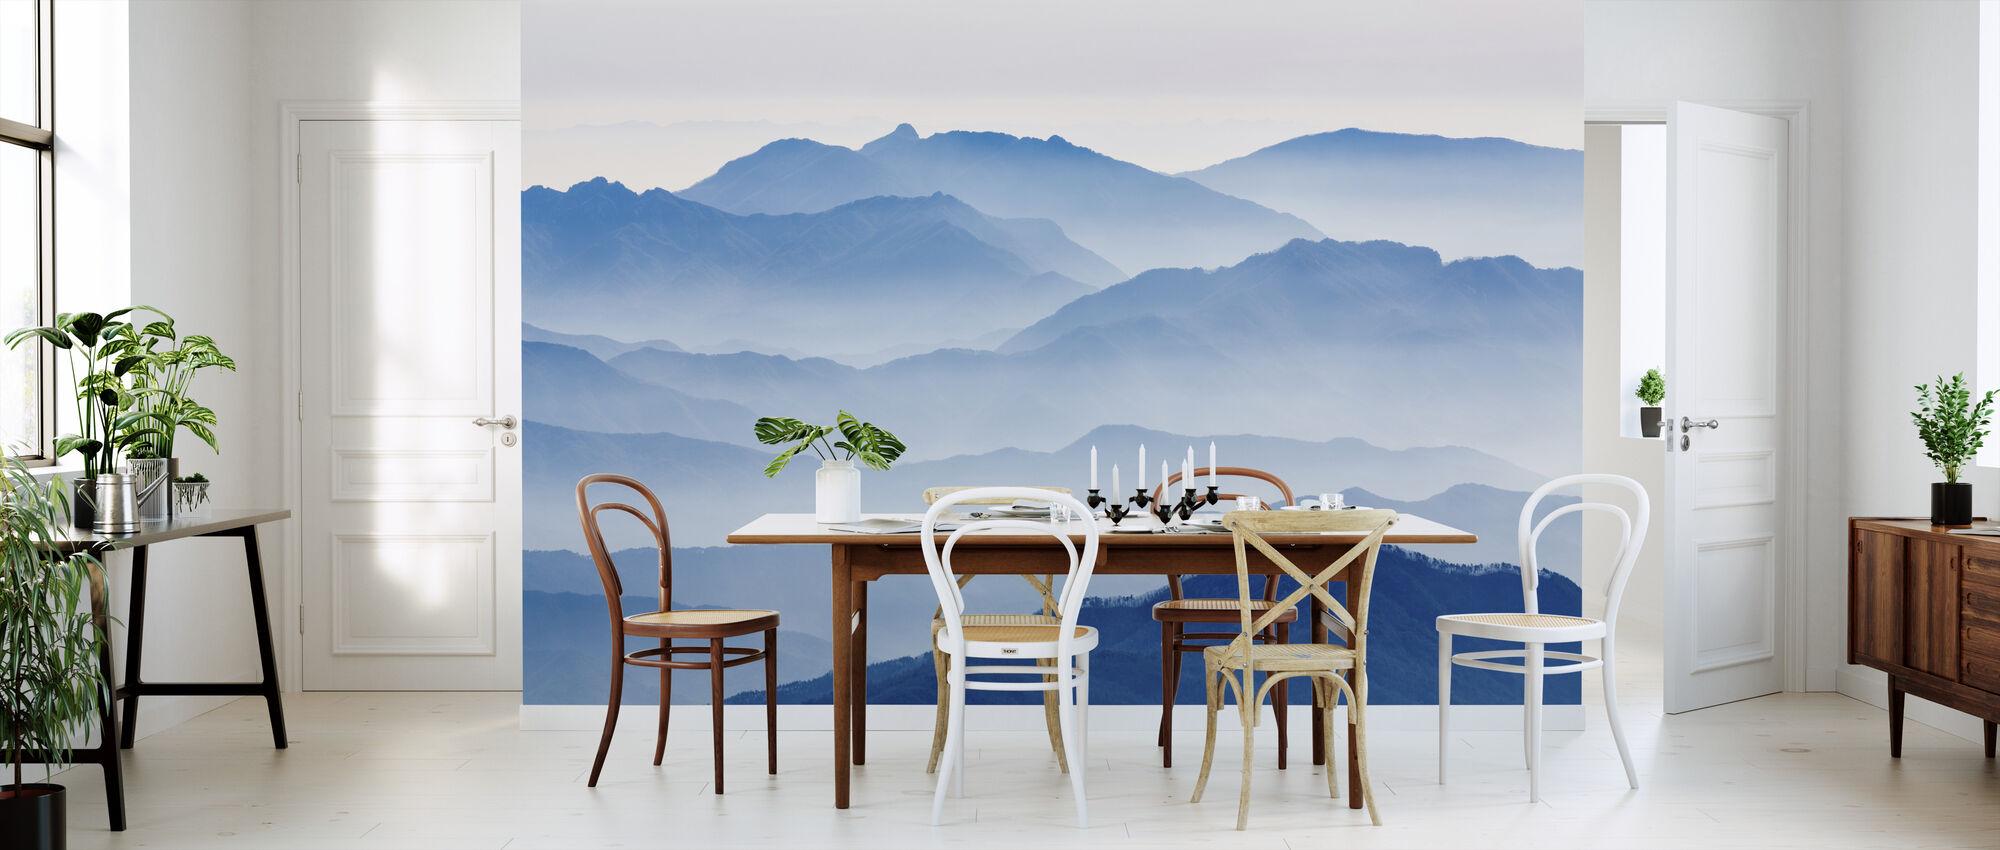 Misty Mountains - Wallpaper - Kitchen